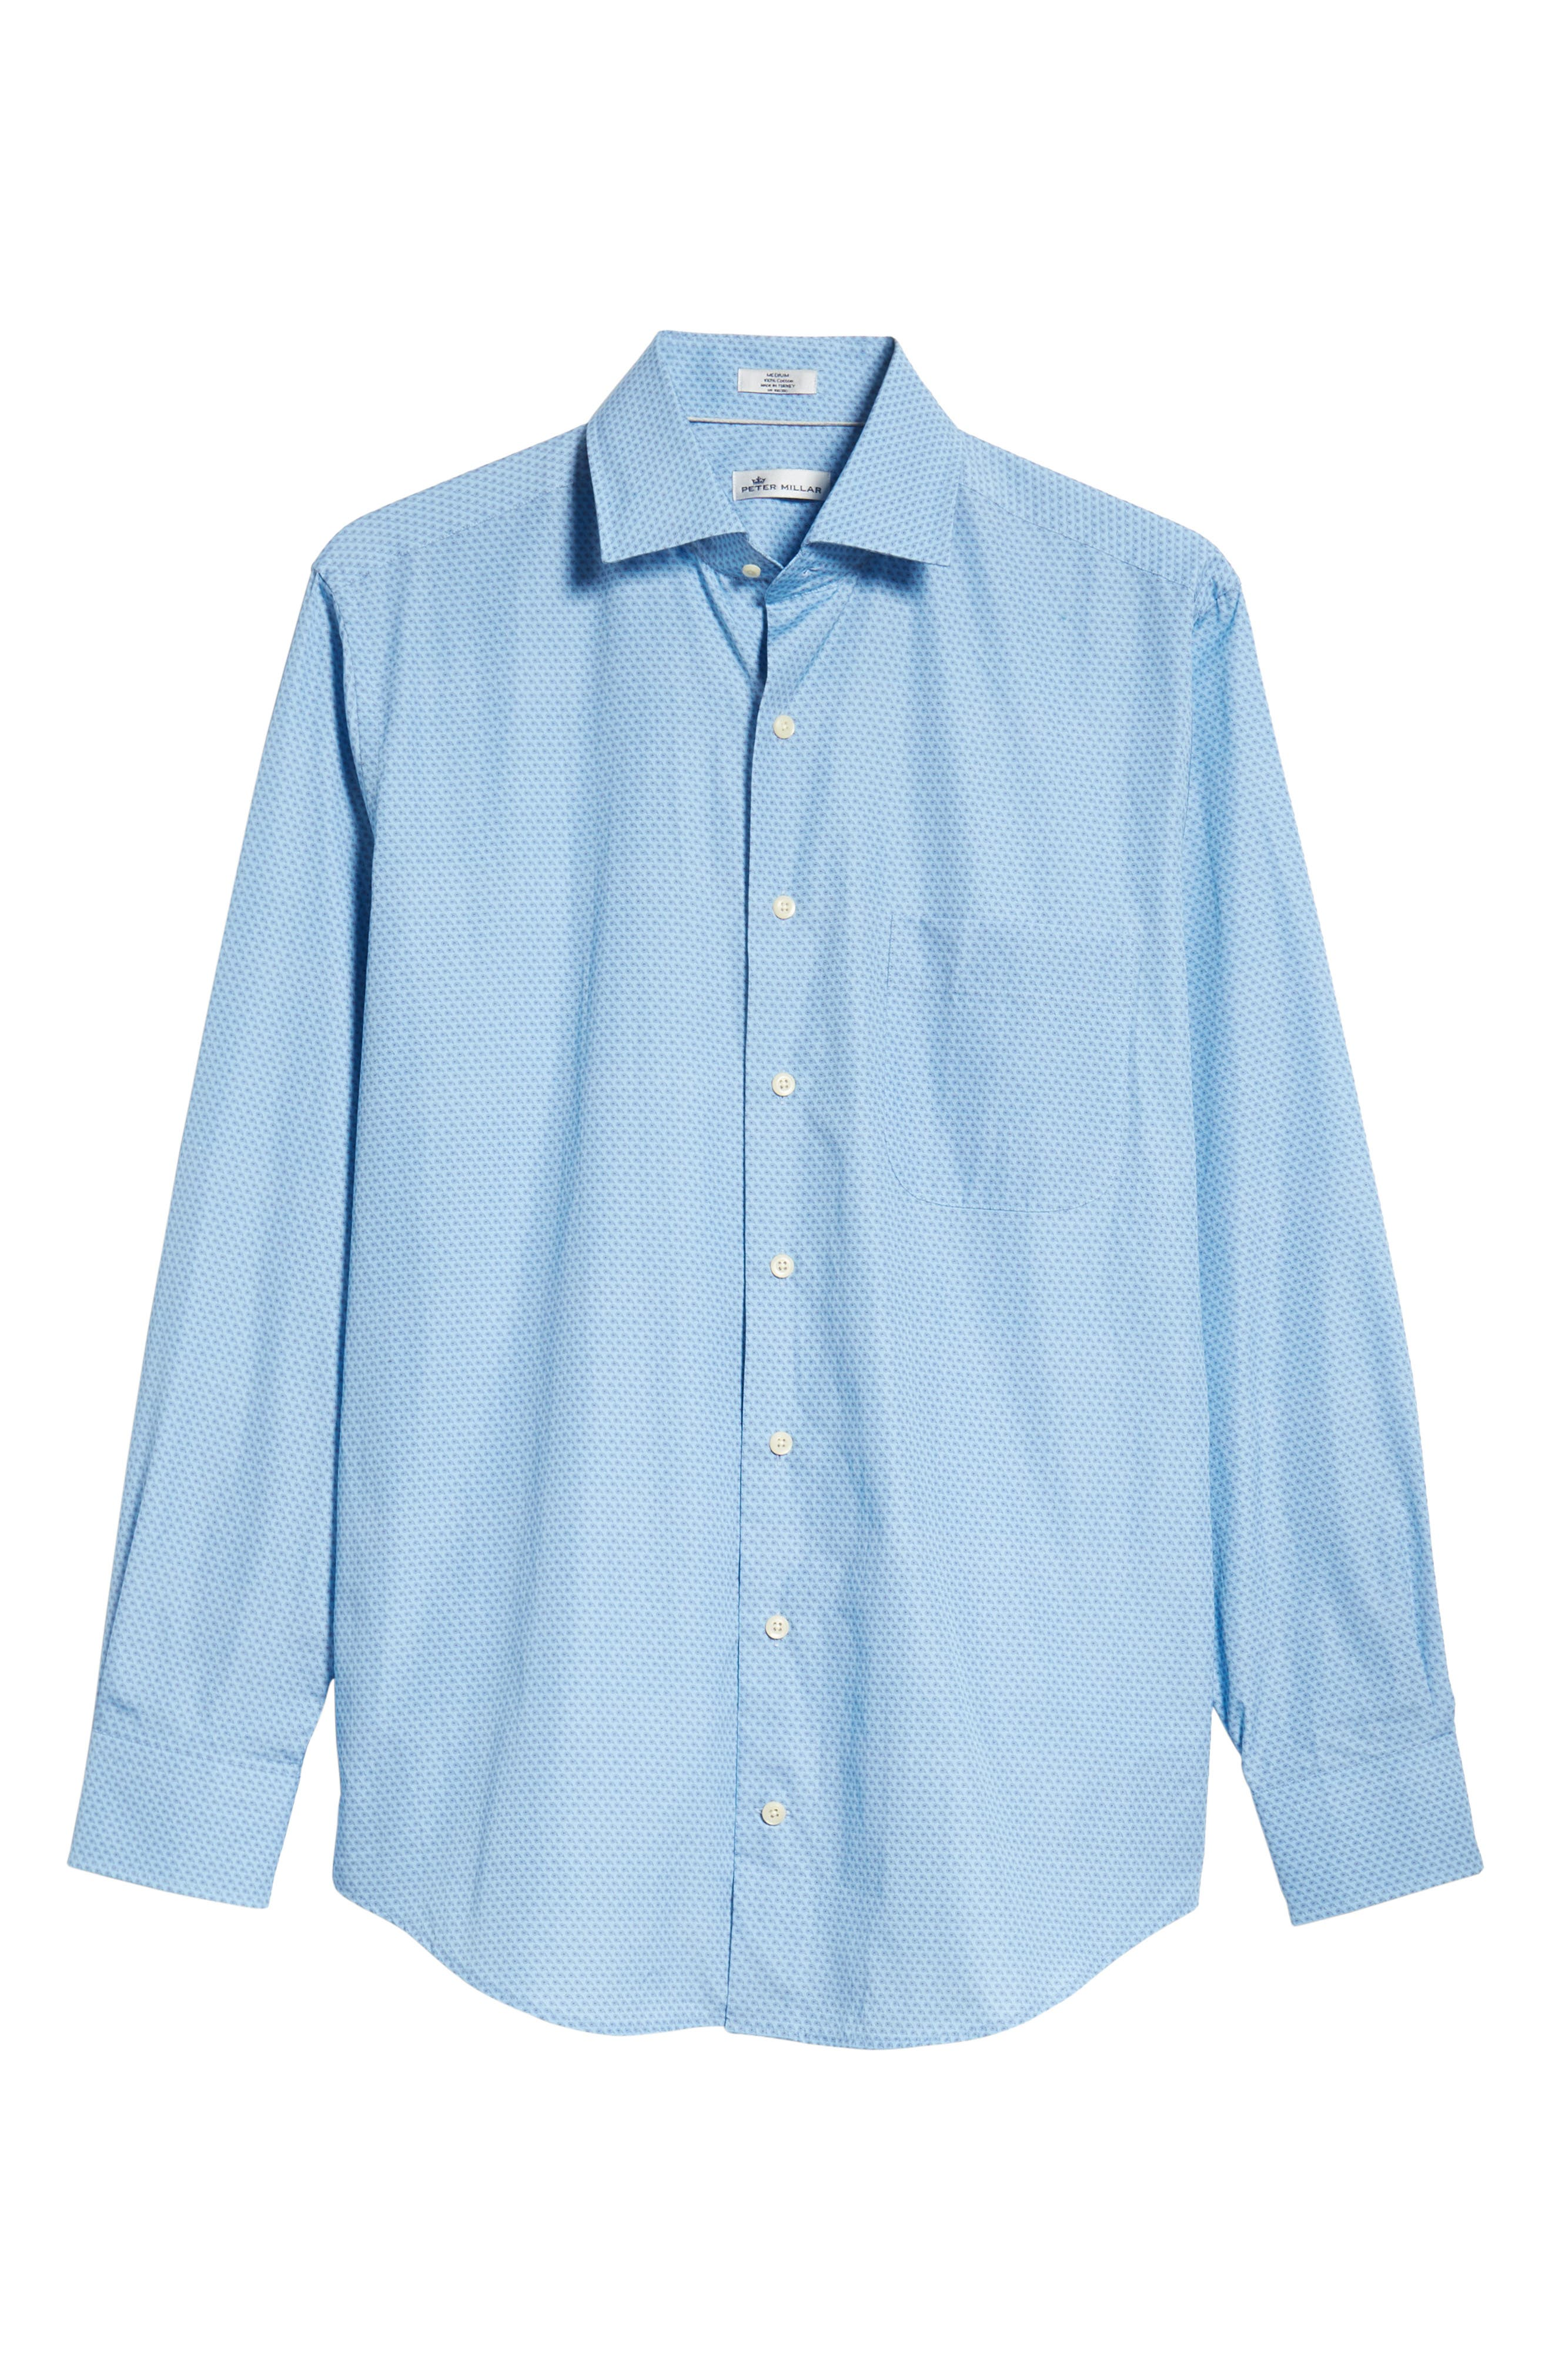 Niblick Regular Fit Sport Shirt,                             Alternate thumbnail 5, color,                             BLUE